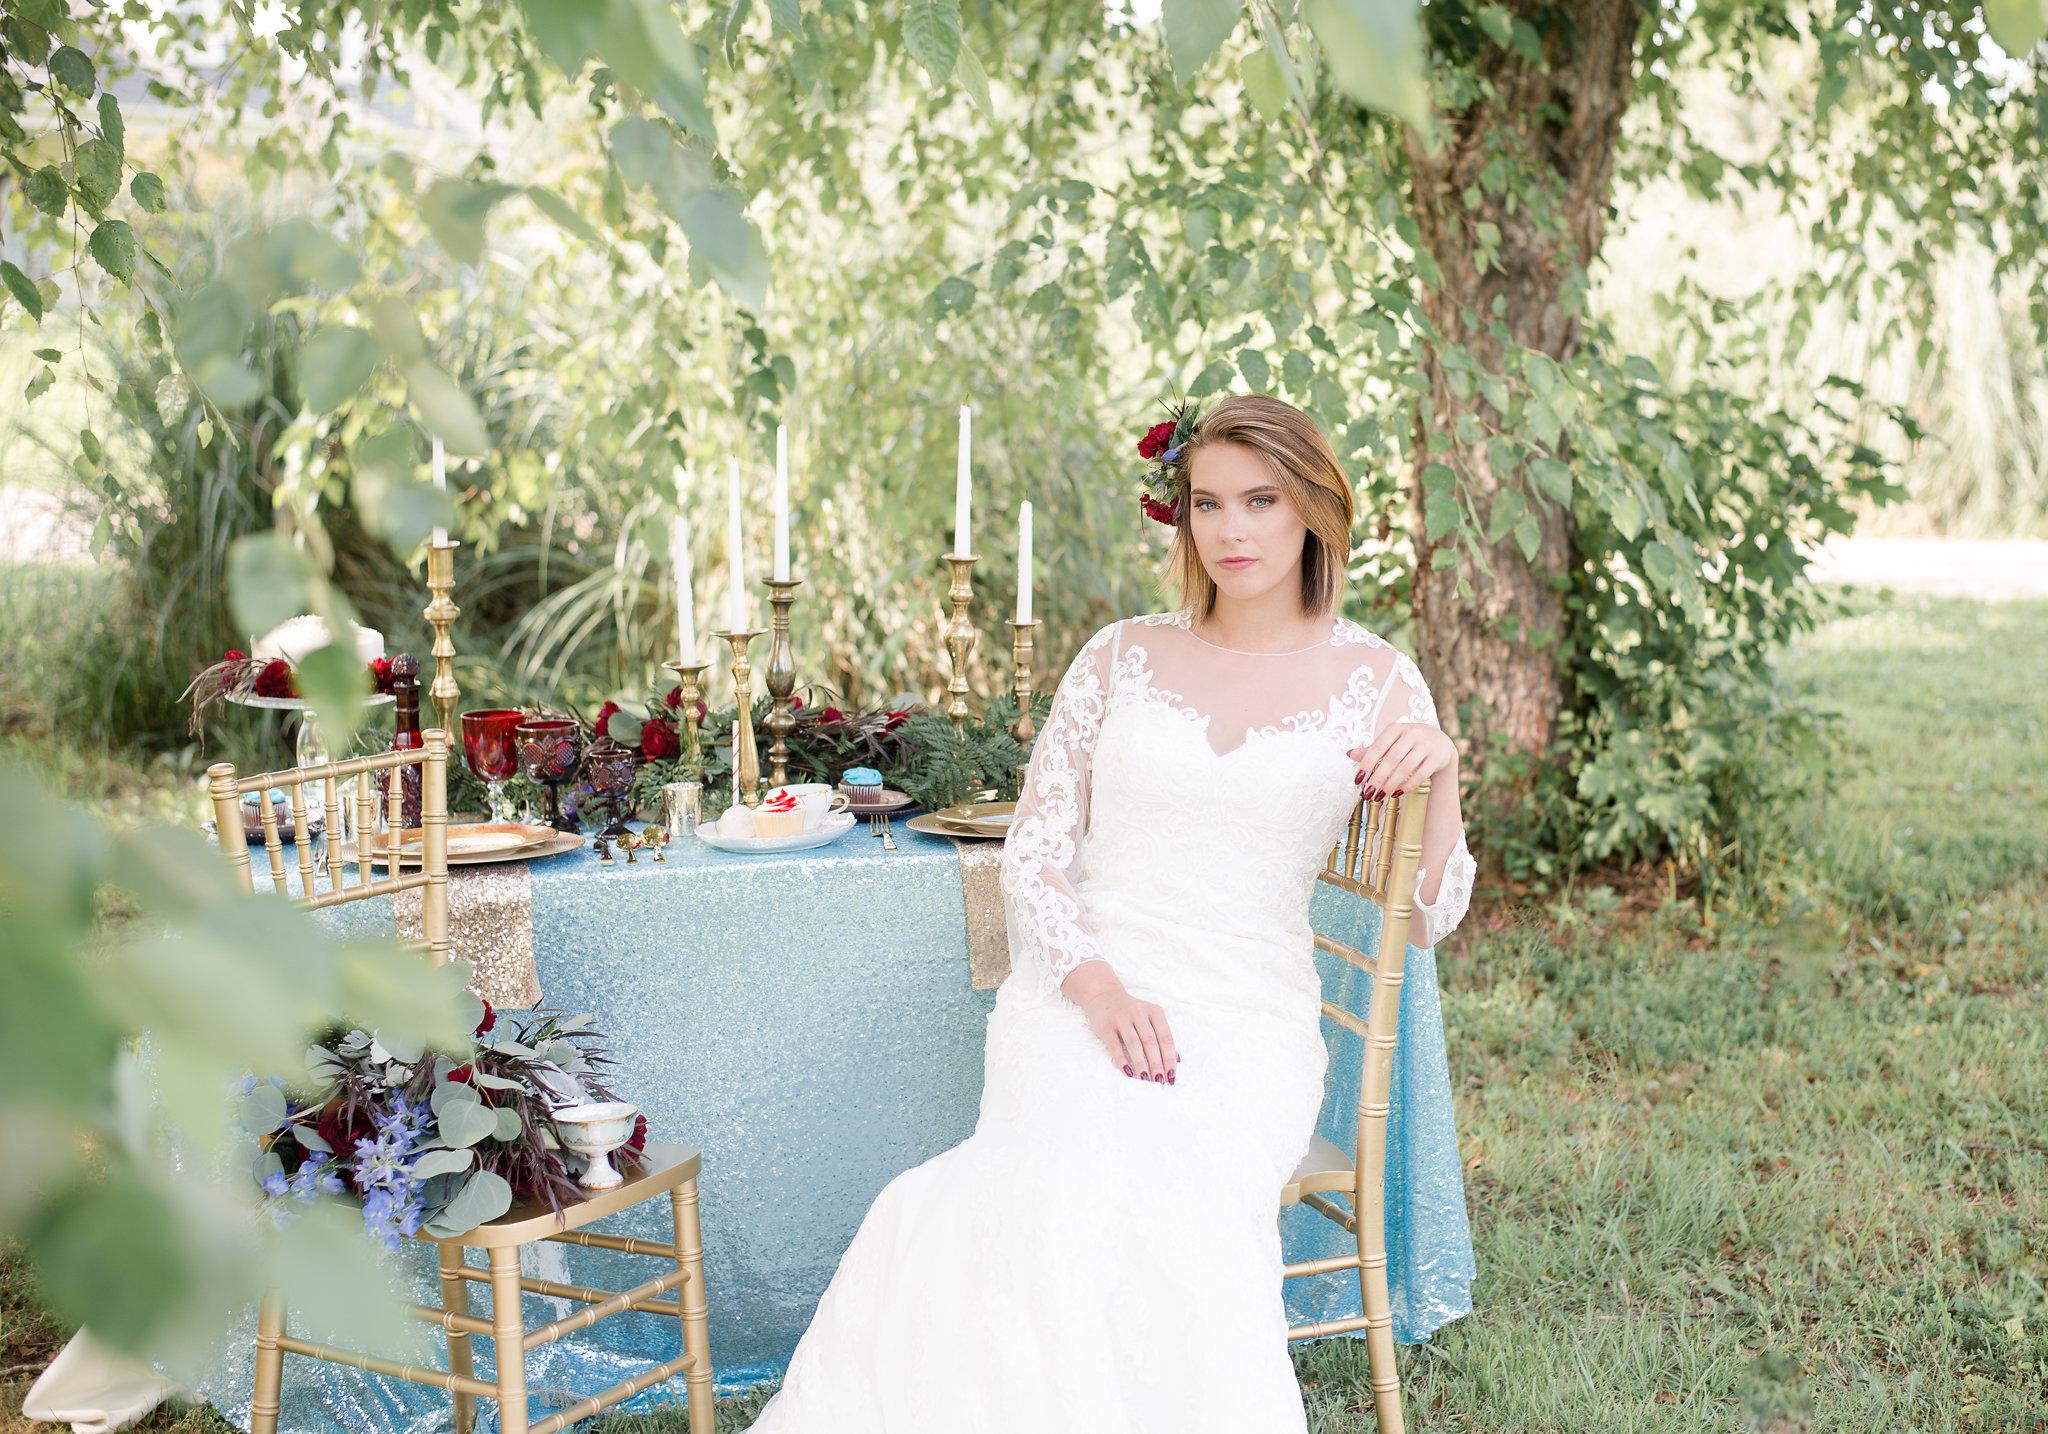 elizabeth-hayden-photography-wedding-arkansas-6184.jpg